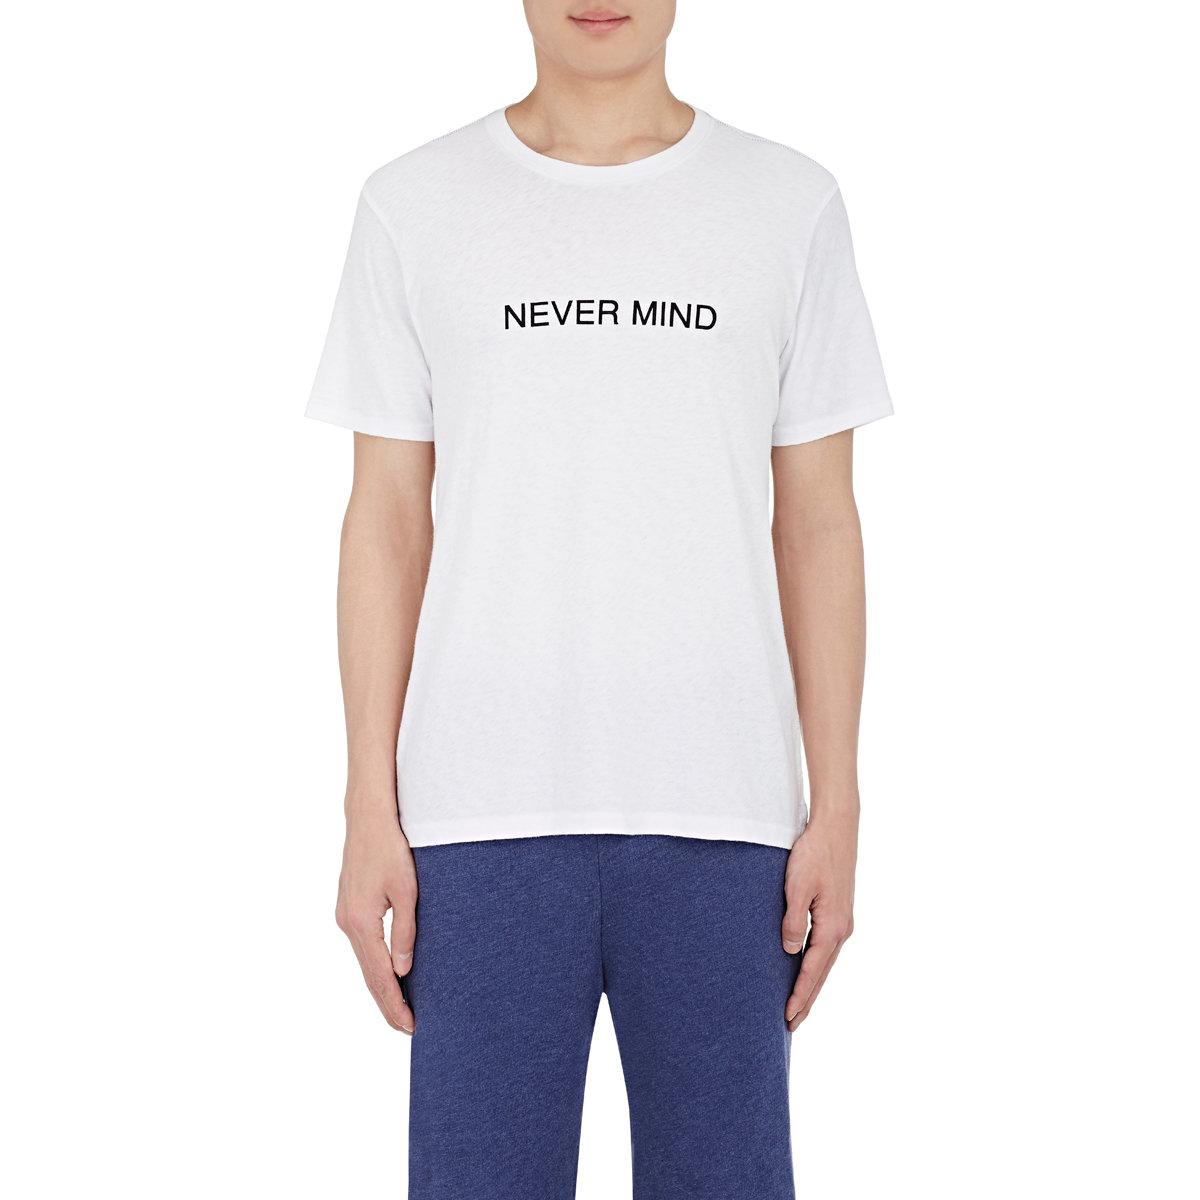 Rag bone men 39 s nevermind t shirt in white for men lyst for Rag and bone t shirts